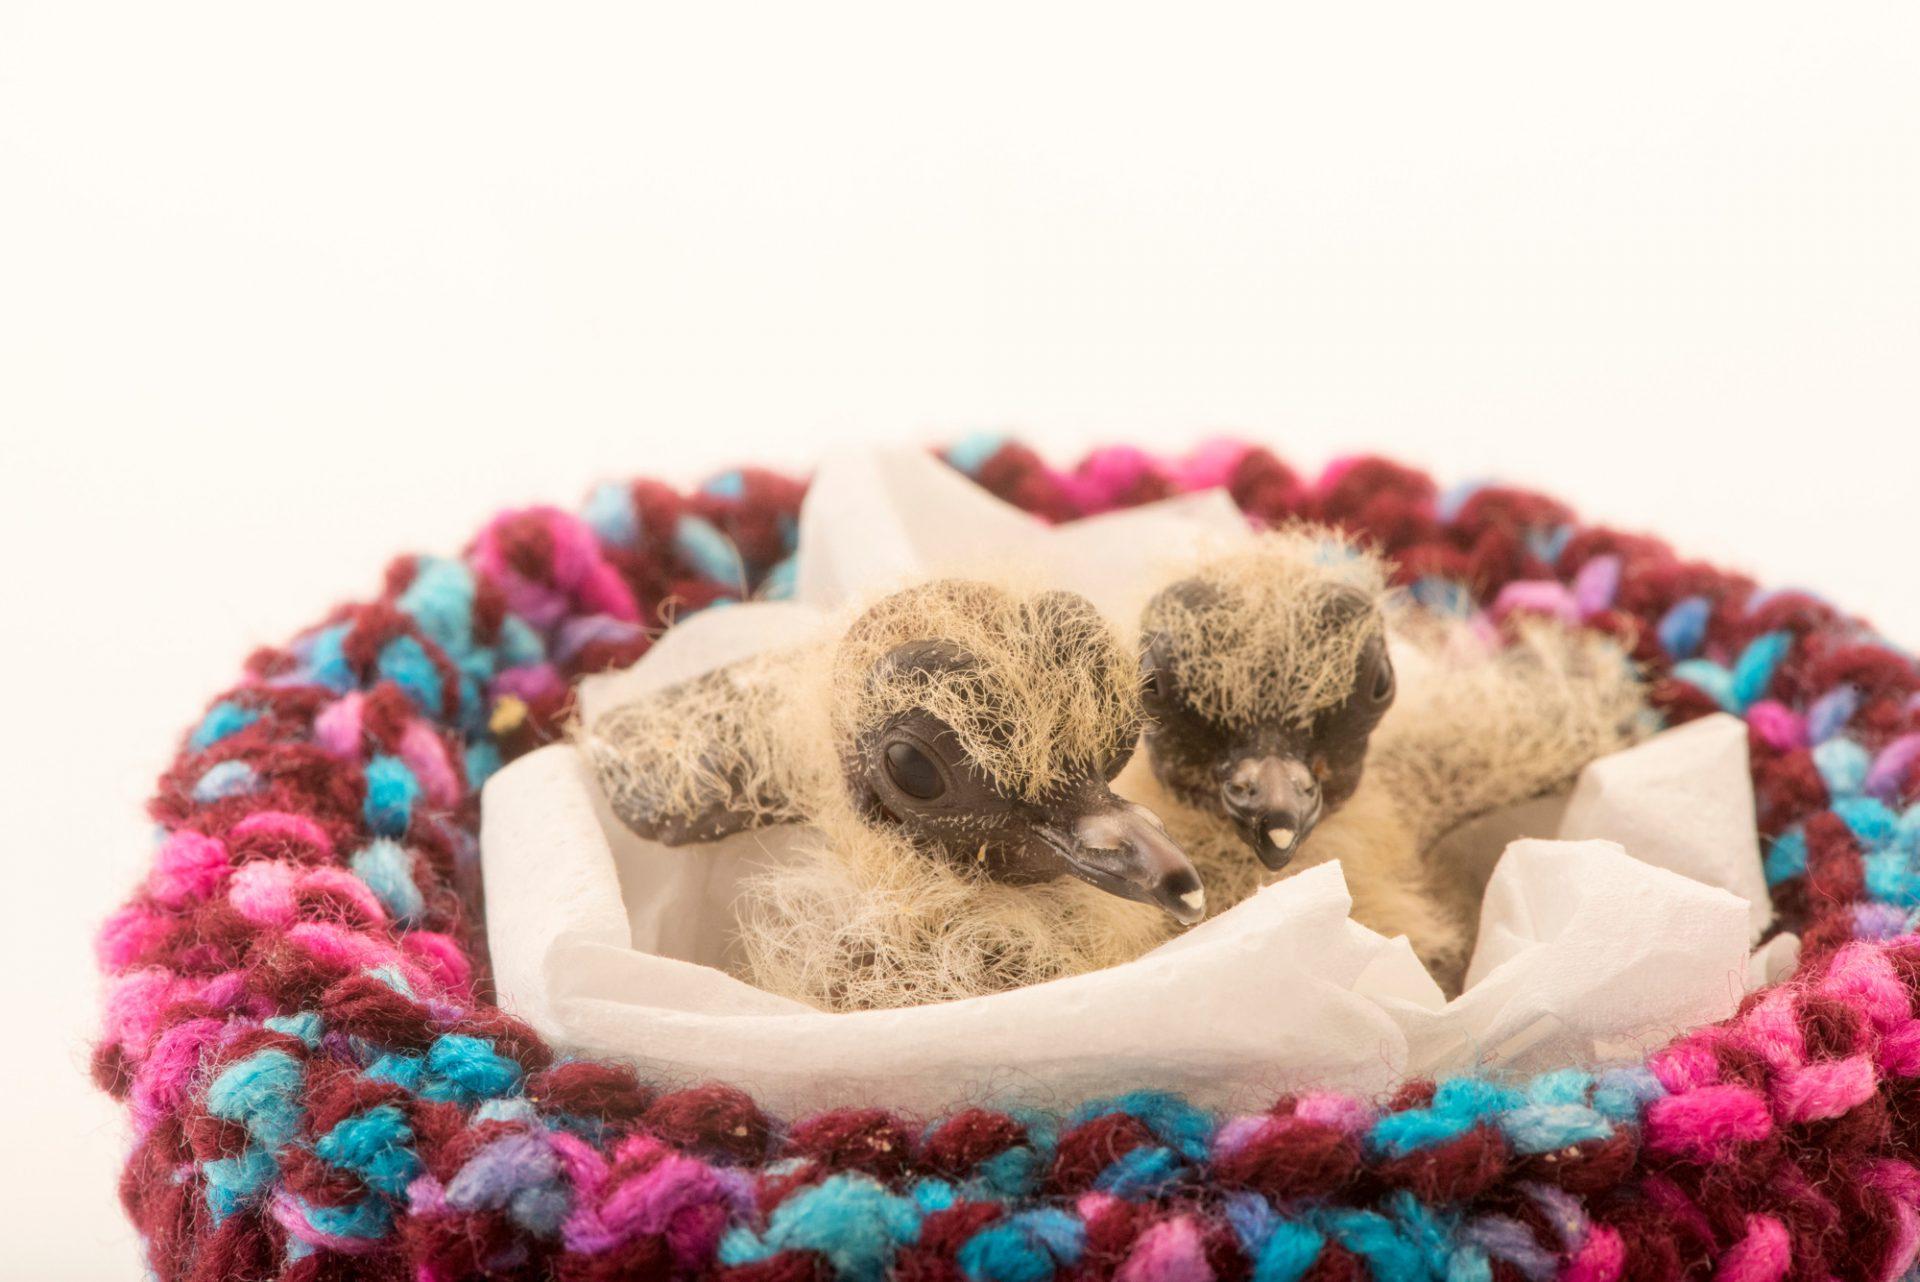 Photo: Two-day-old mourning dove hatchlings (Zenaida macroura) at Wildlife Care Association